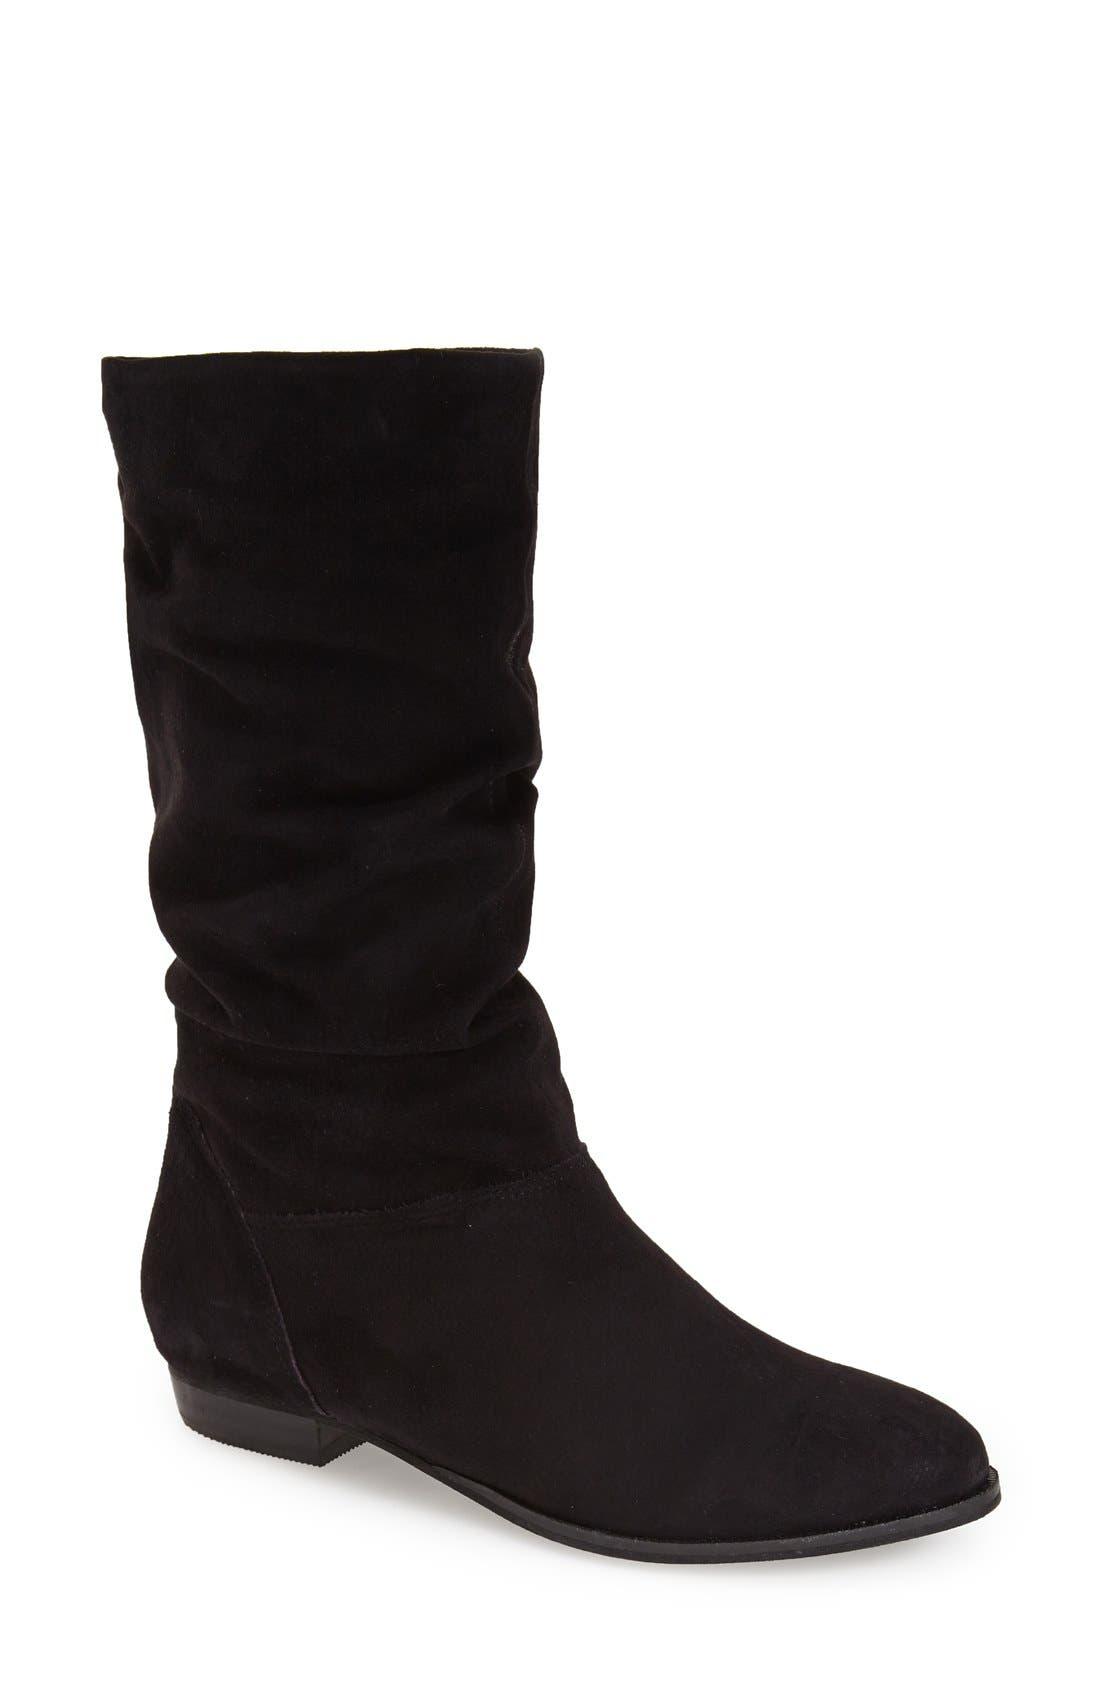 Alternate Image 1 Selected - Dune London'Relissa' Scrunch Boot(Women)